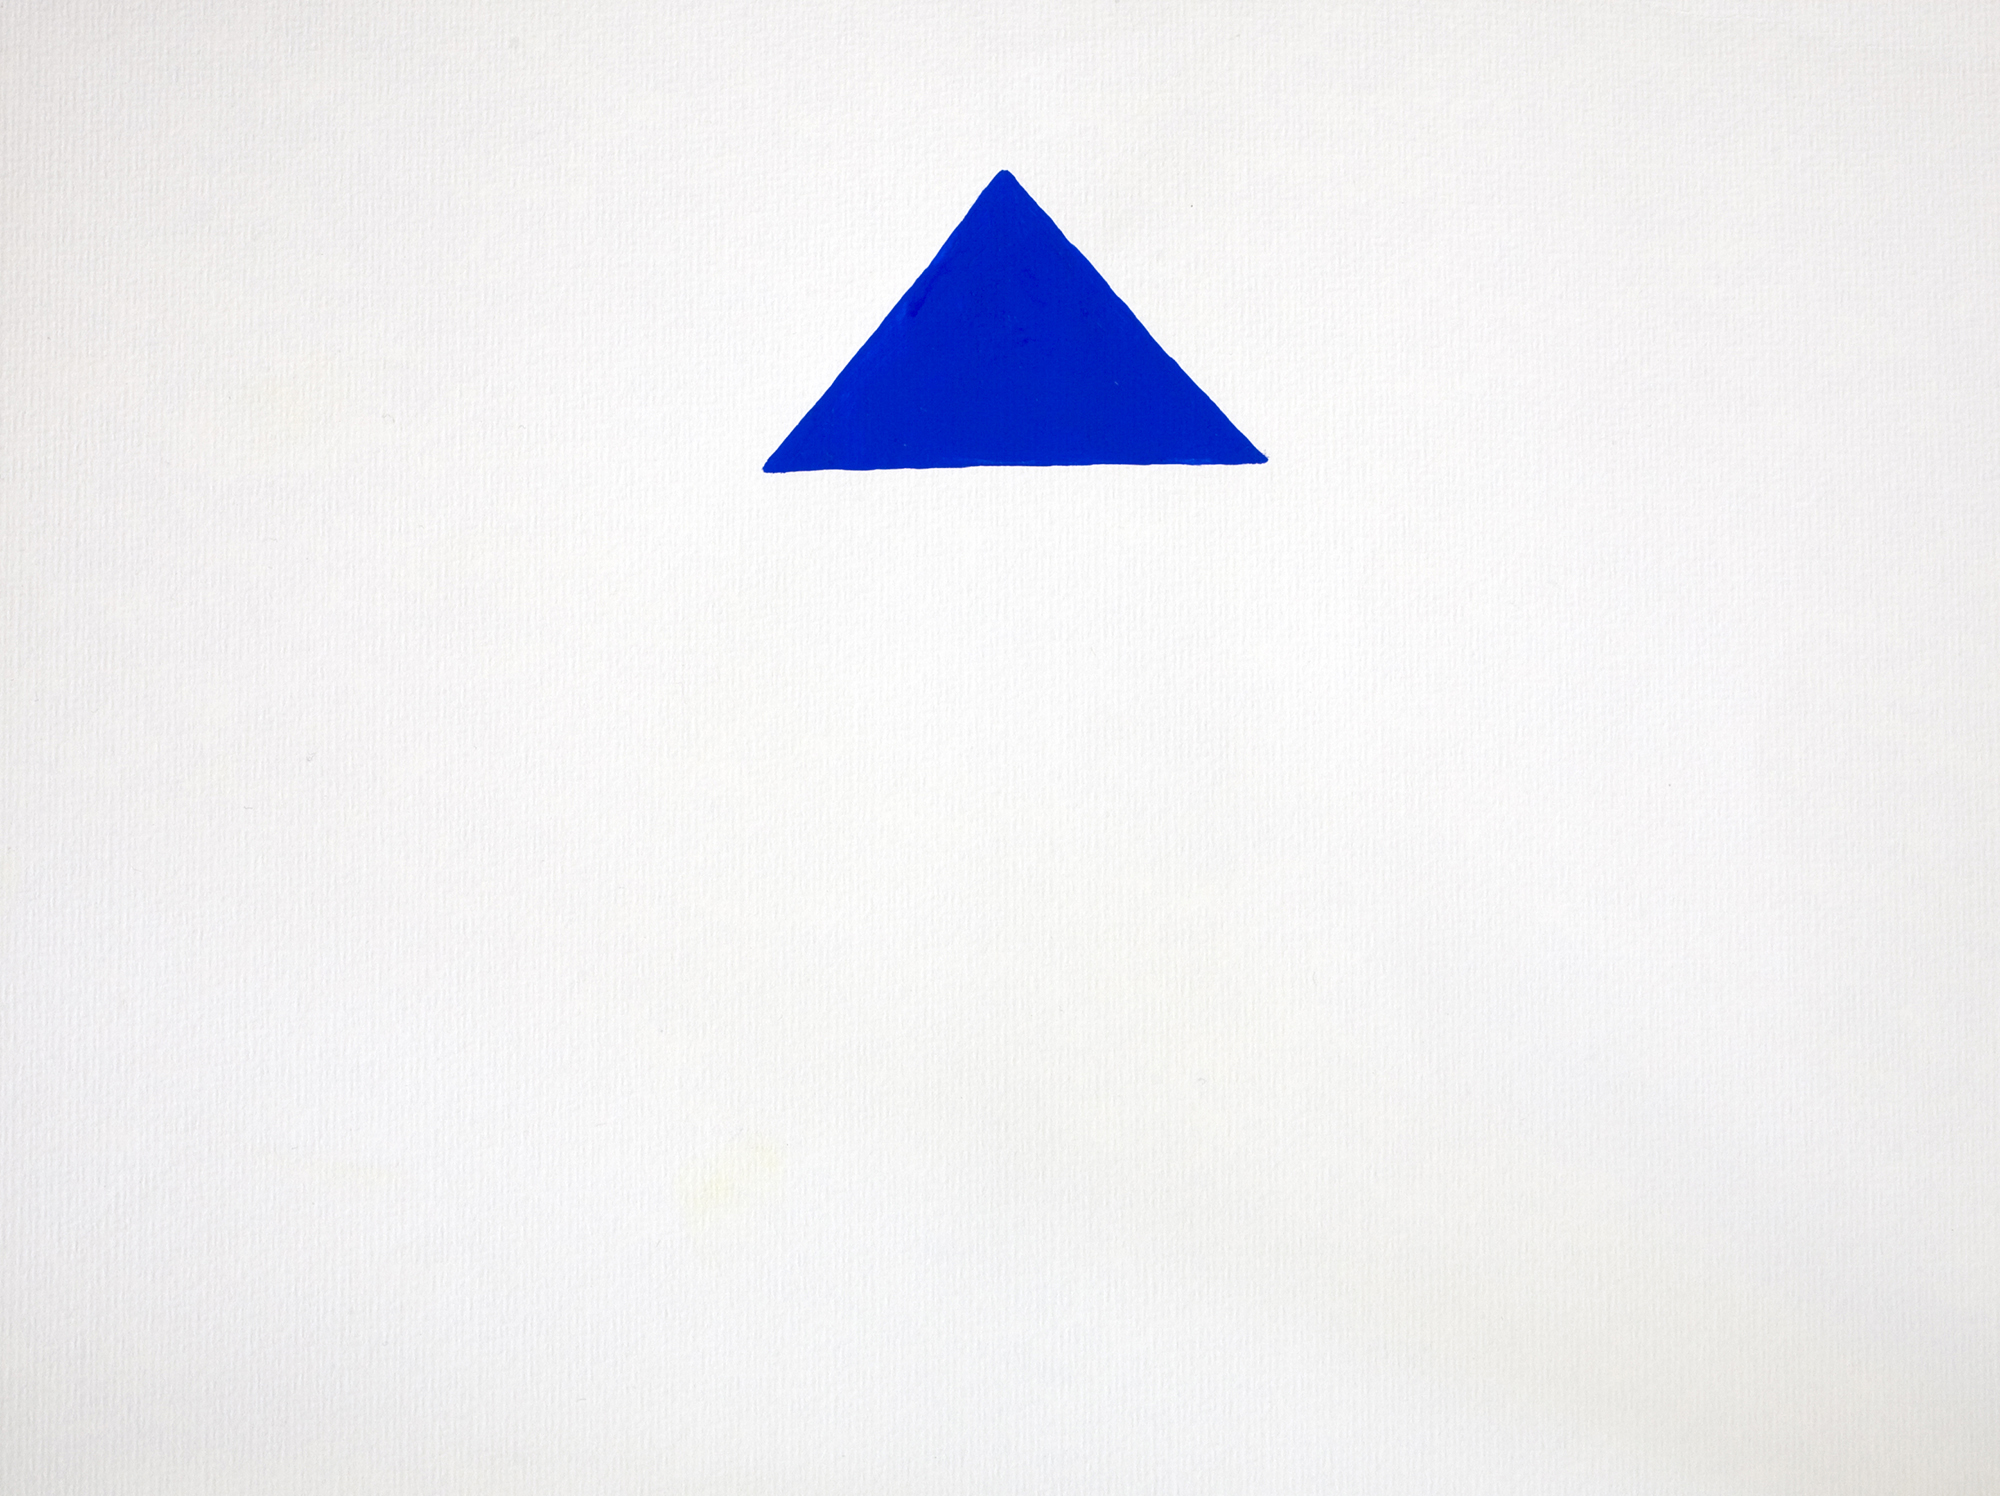 Untitled, 2006, gouache on paper, 30 x 42 cm